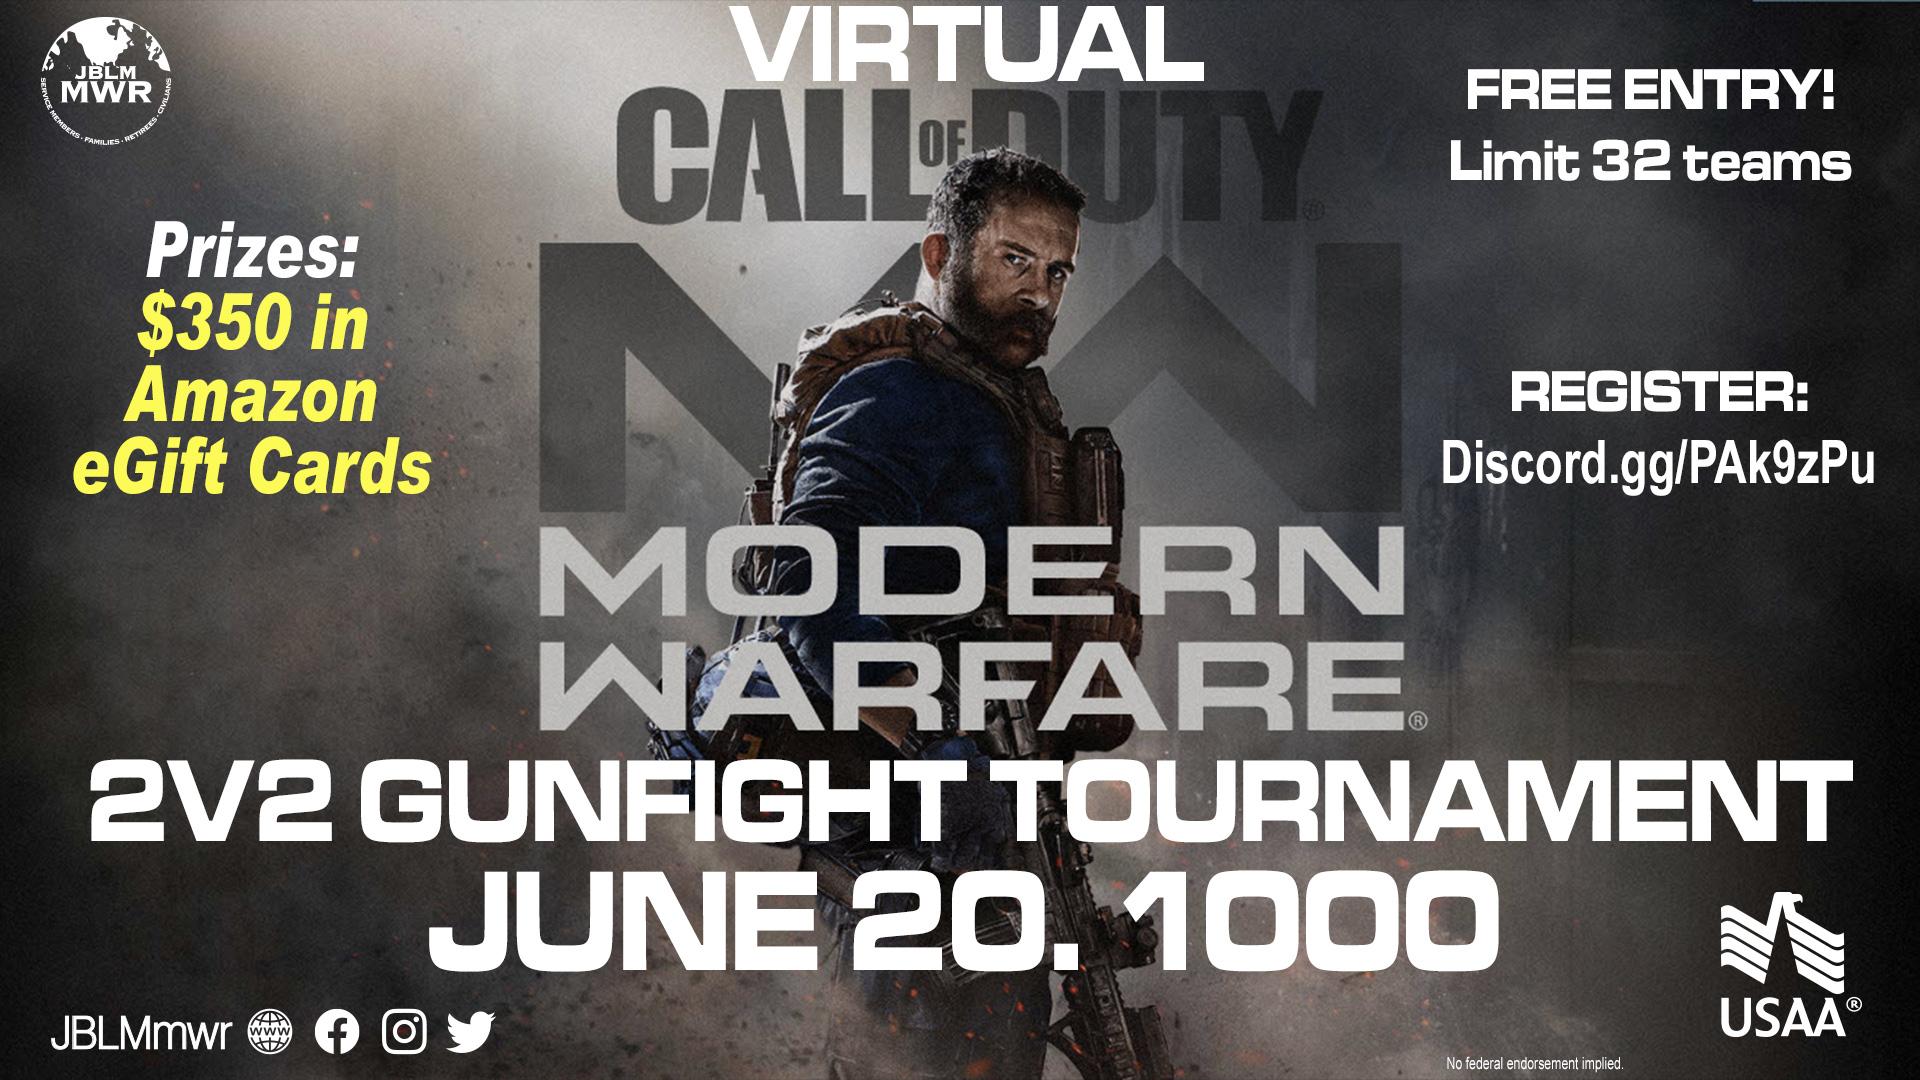 Virtual Call of Duty MW 2v2 Gunfight Tournament